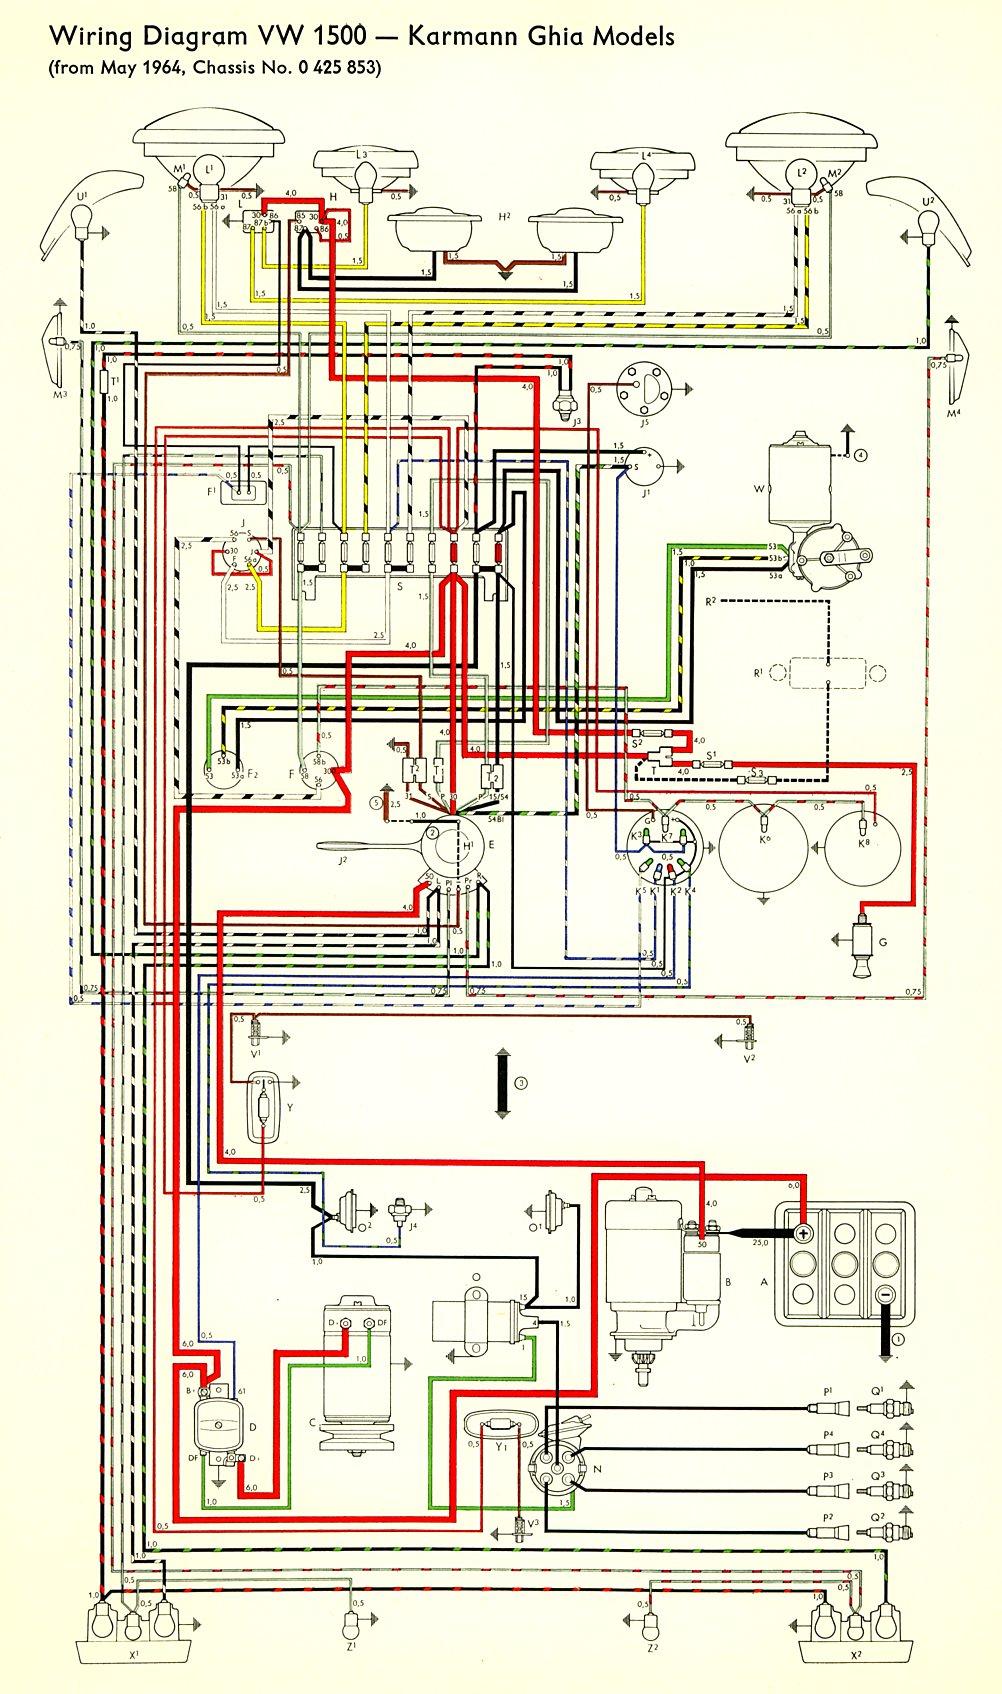 hight resolution of 1964 volkswagen wiring diagram 1964 free engine image 1964 vw beetle wiring diagram 1967 vw wiring